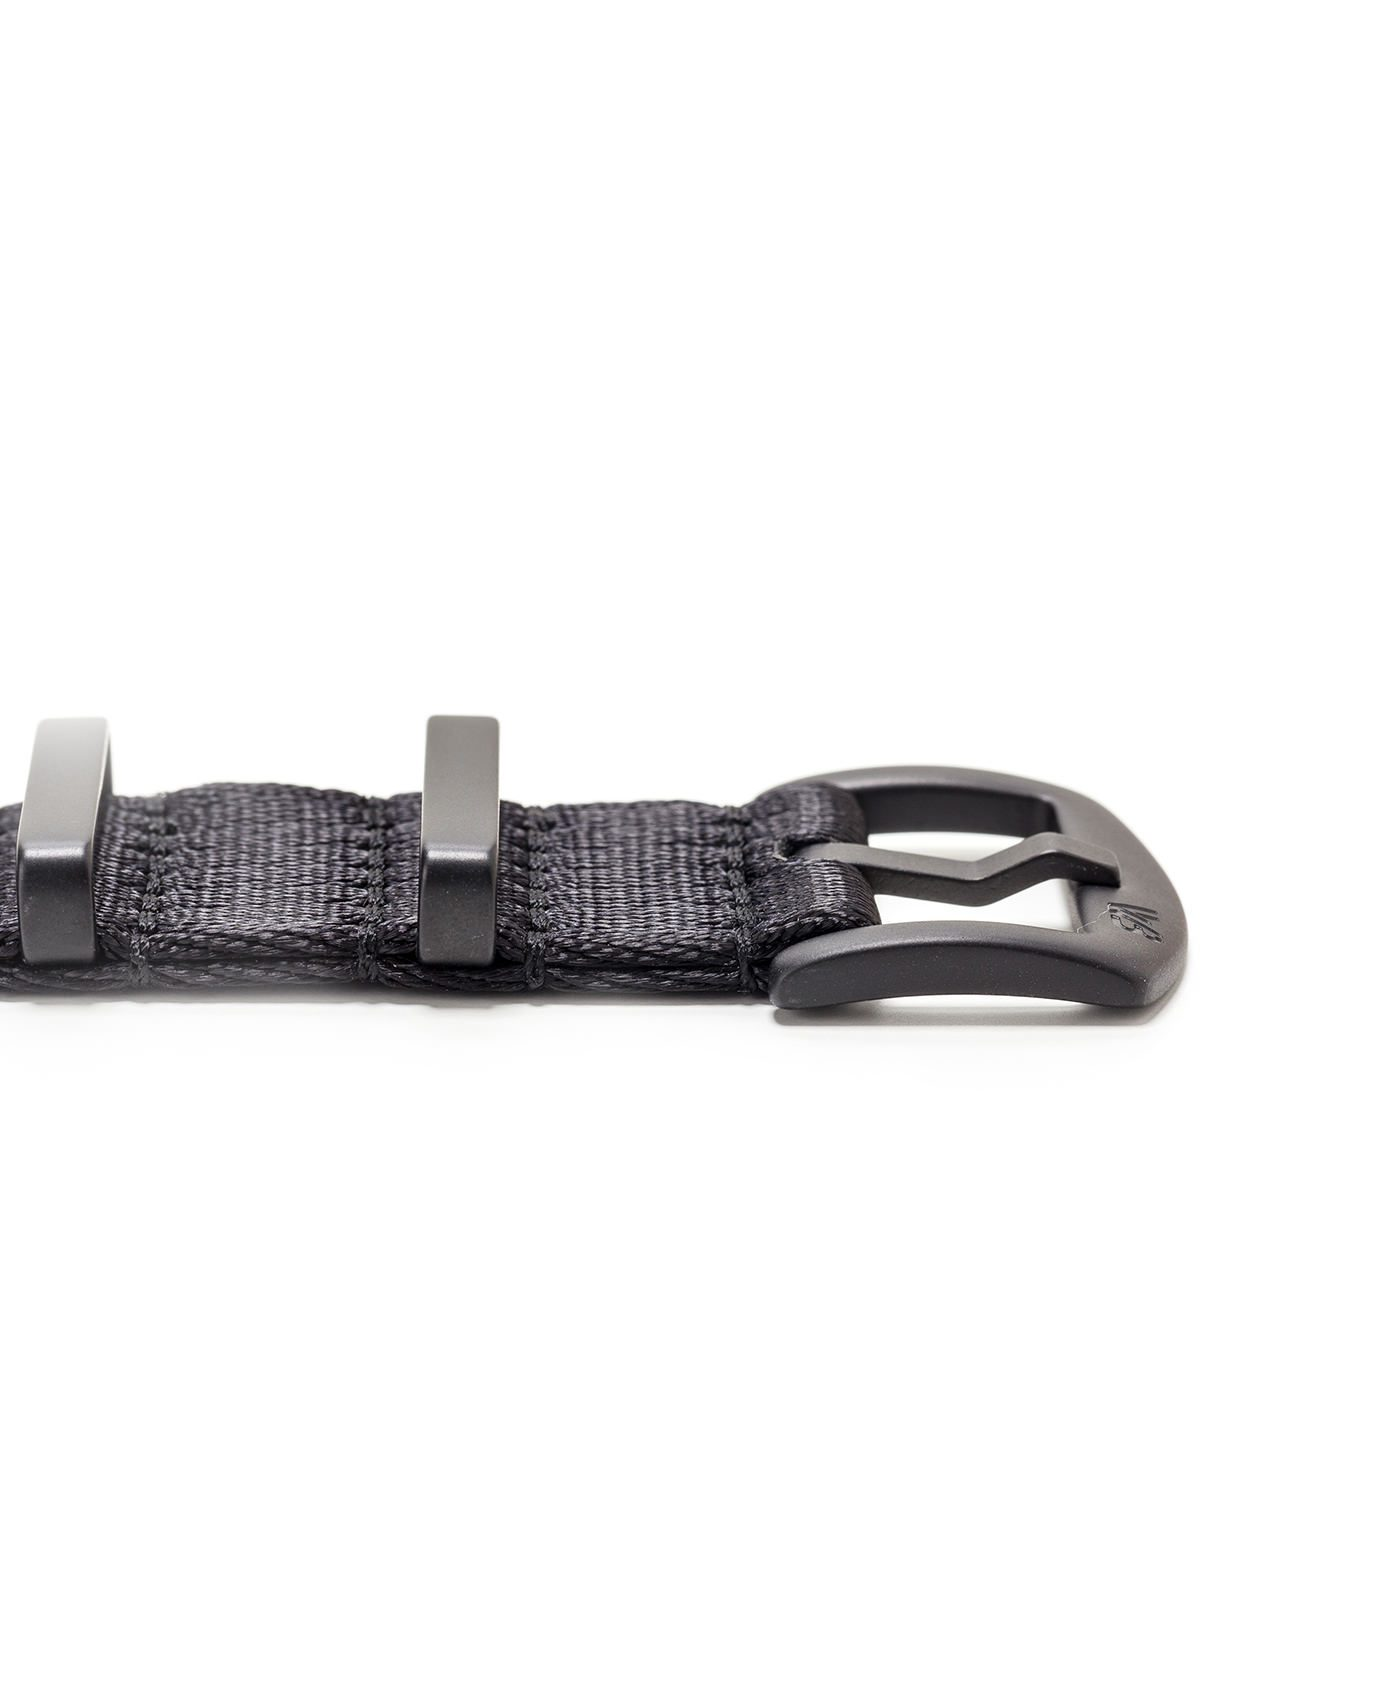 Watchbandit WB original Wristporn Nato strap in black with black clasp close up